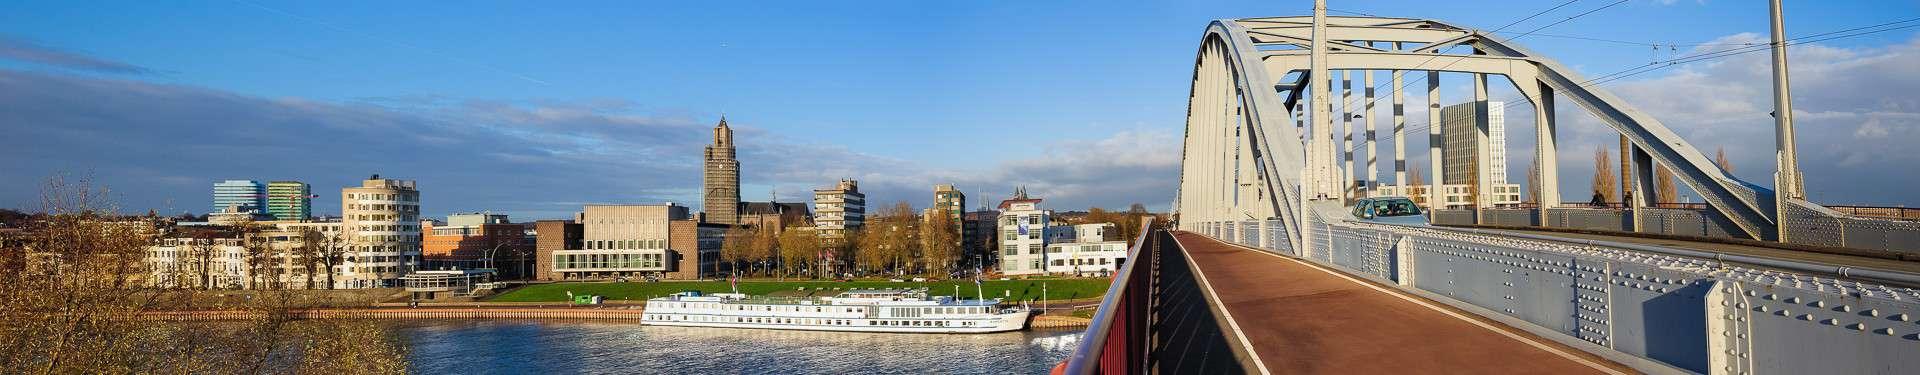 Arnhem Rijnkade panorama